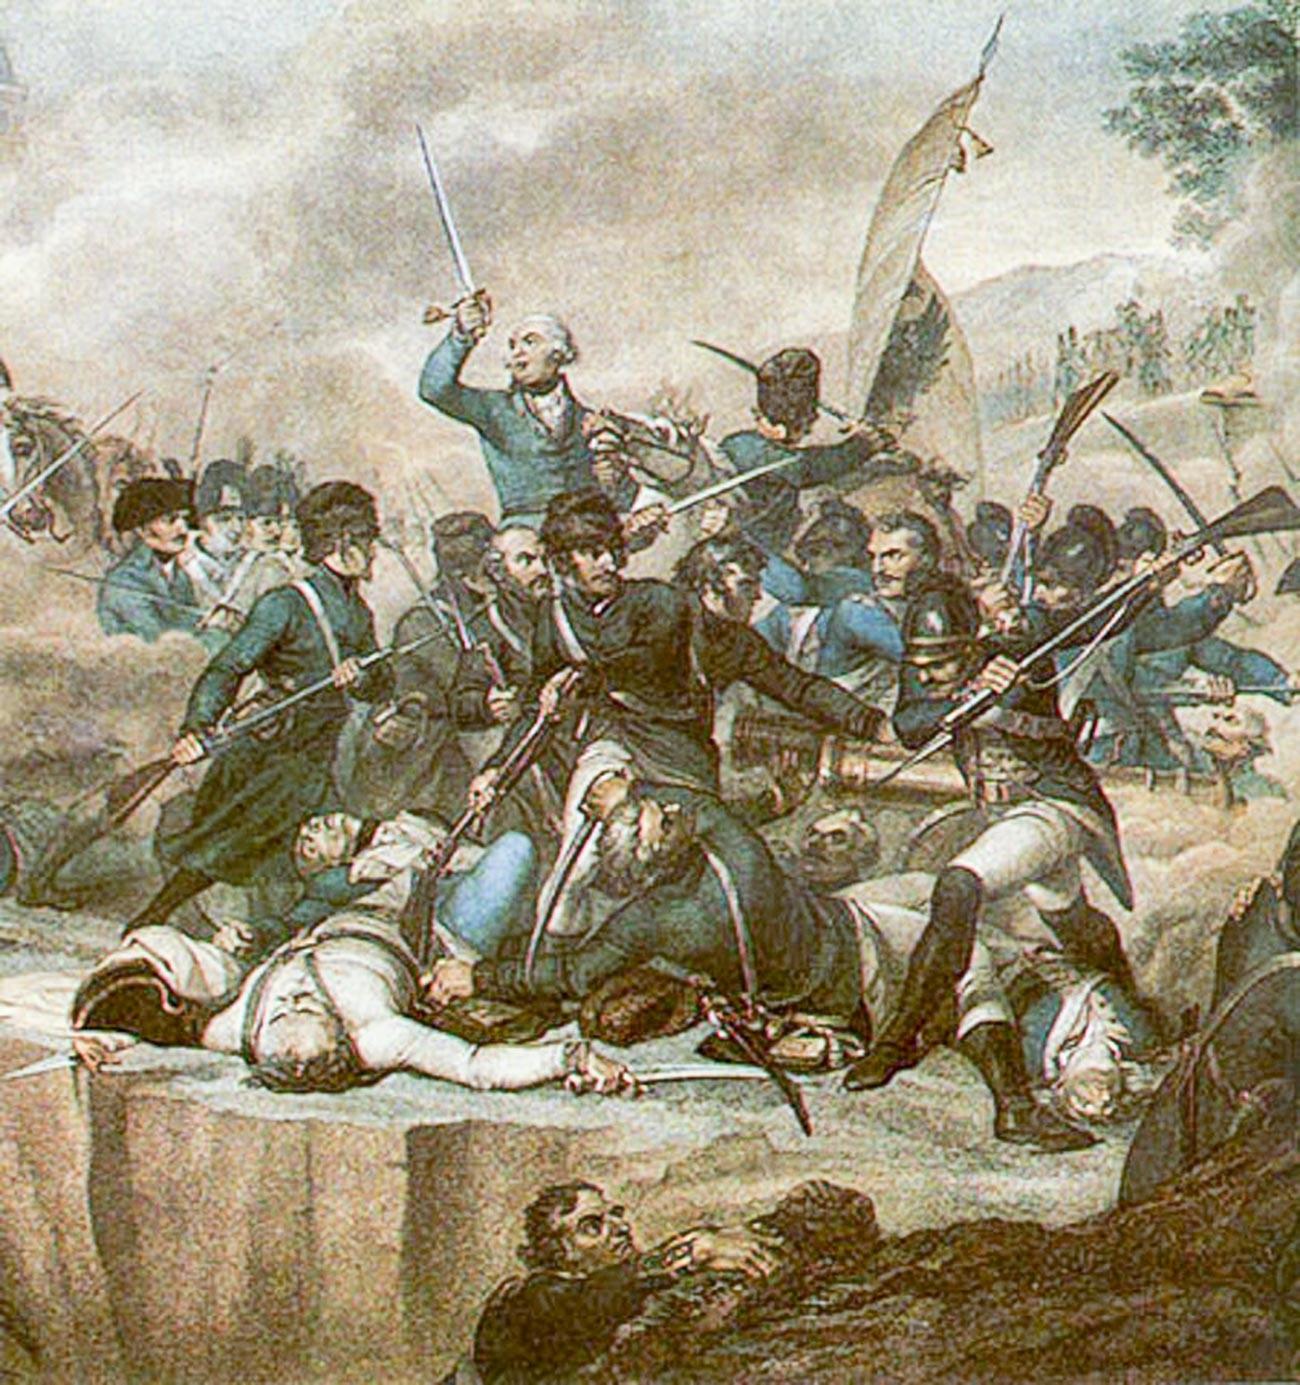 Jenderal Suvorov dalam pertempuran di tepi Sungai Adda pada 27 April 1799.